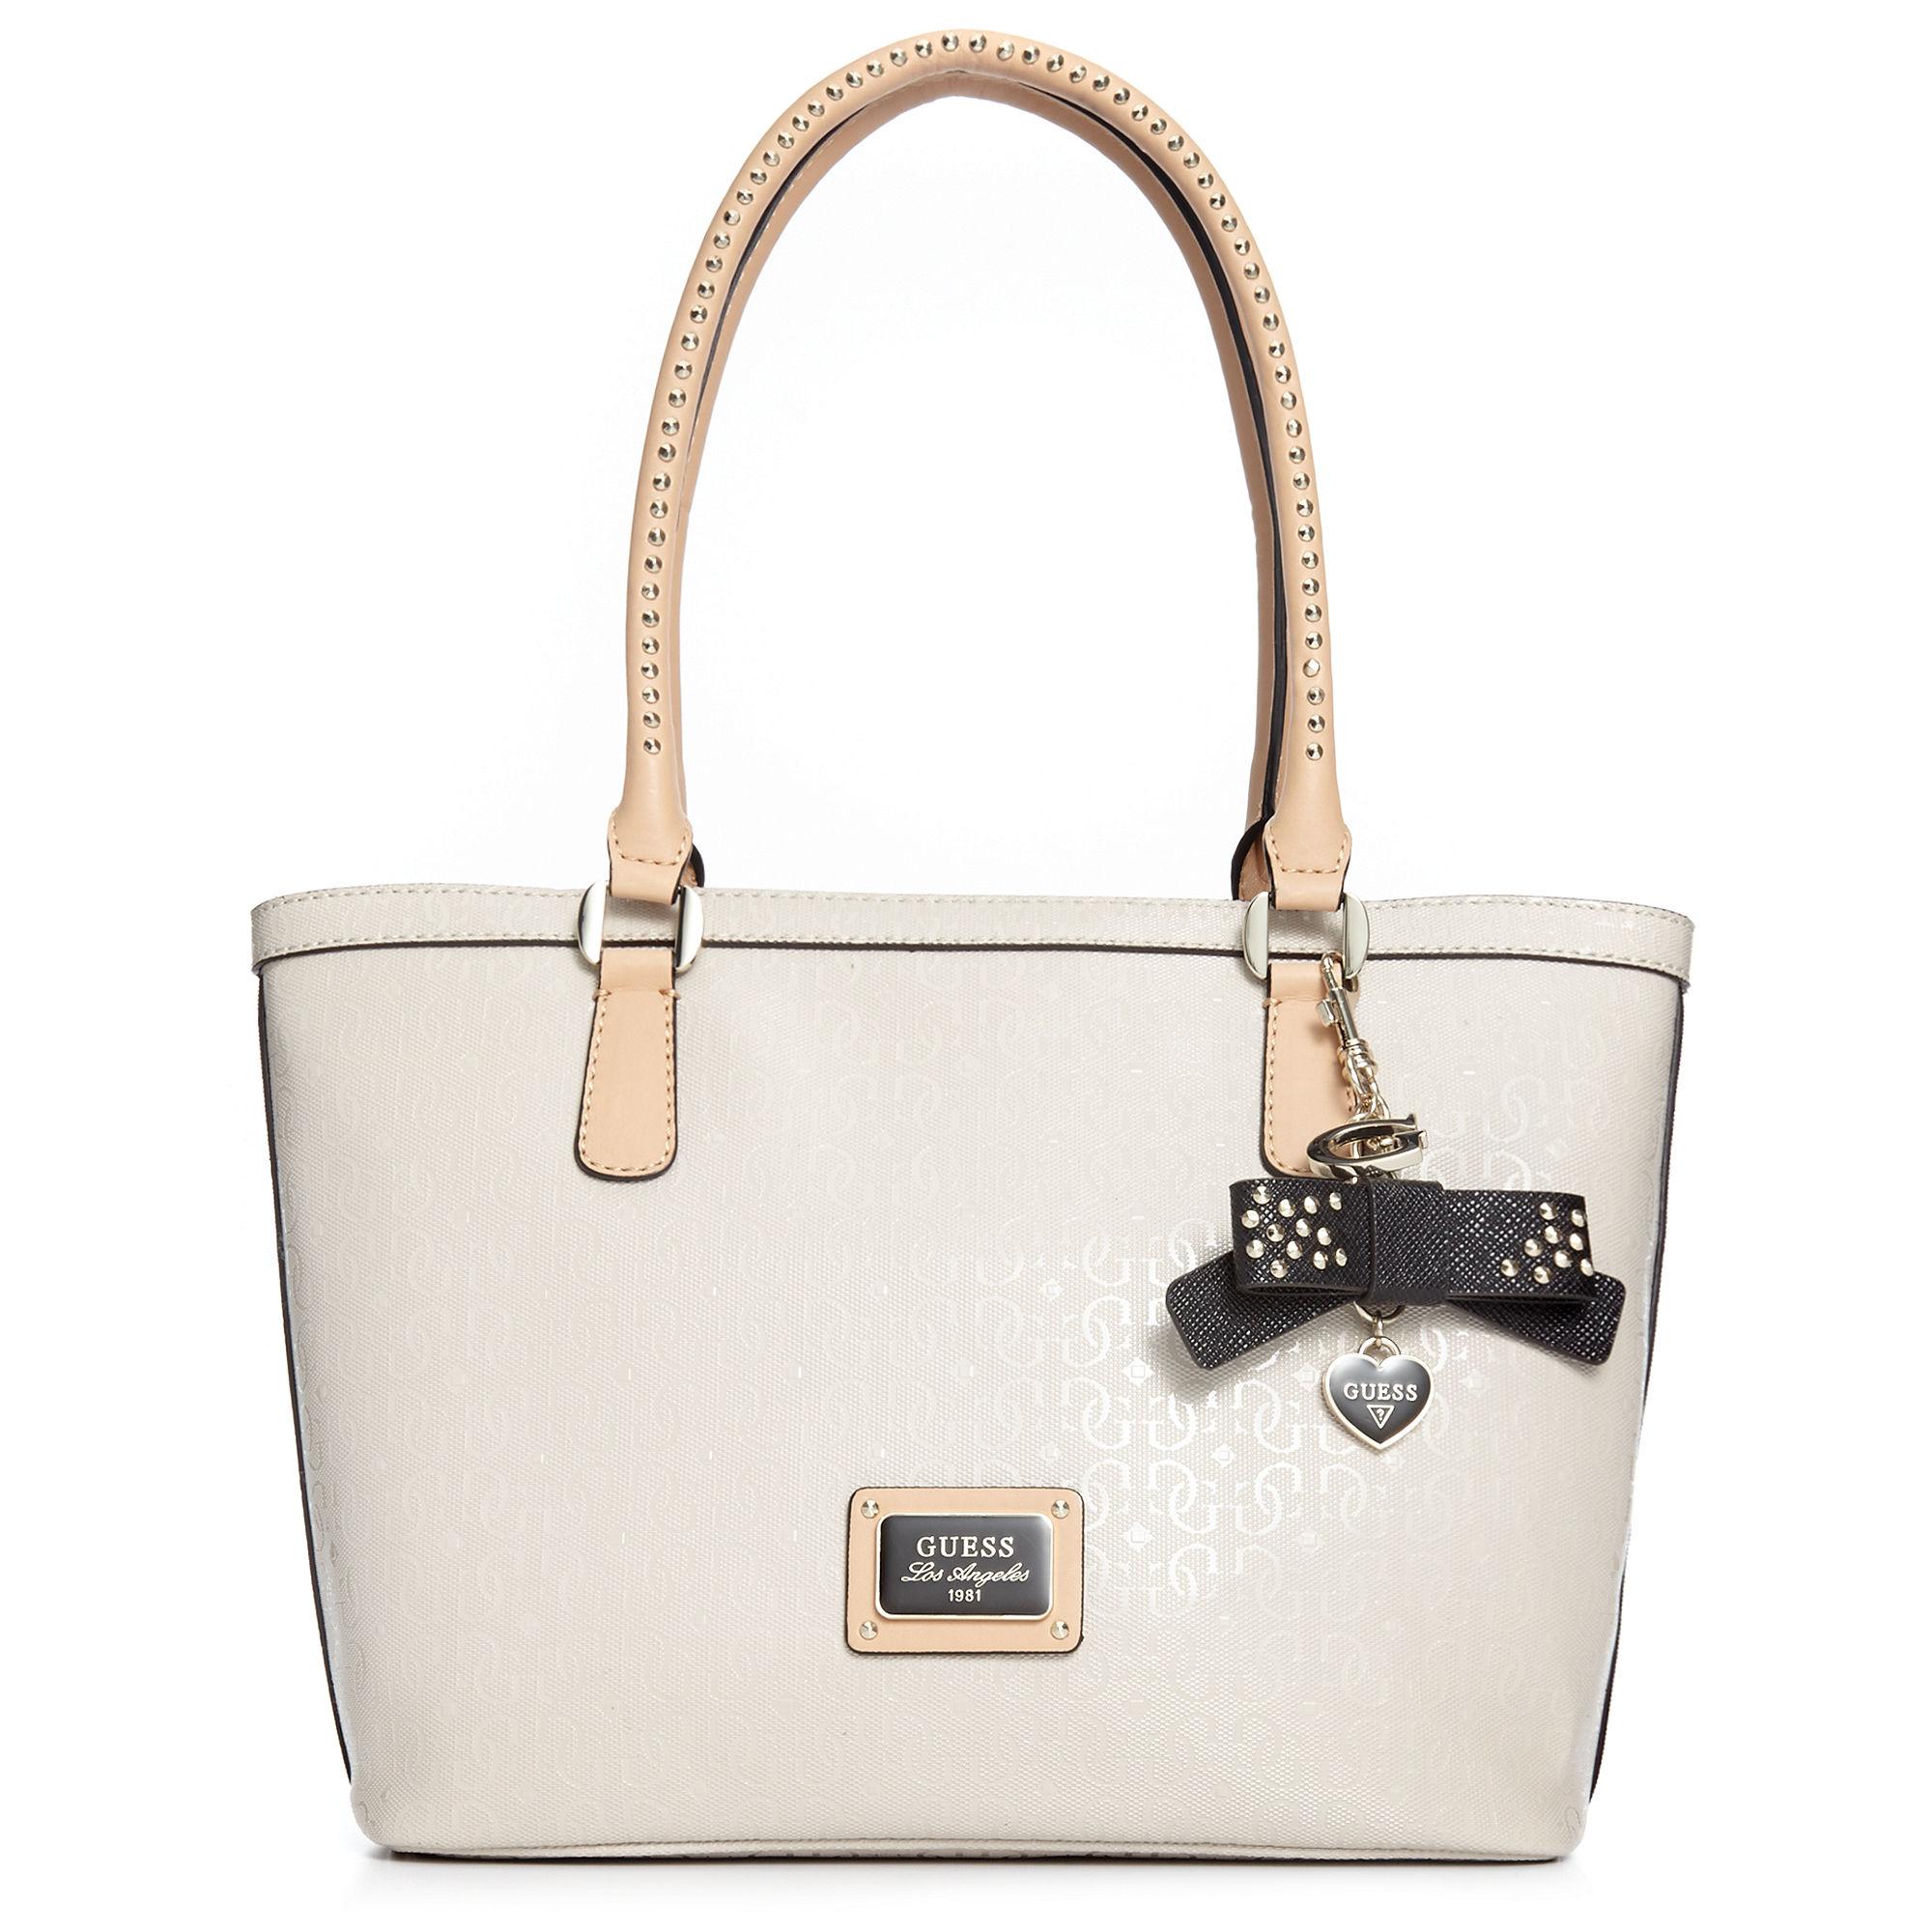 Guess White Guess Handbag Specks Small Classic